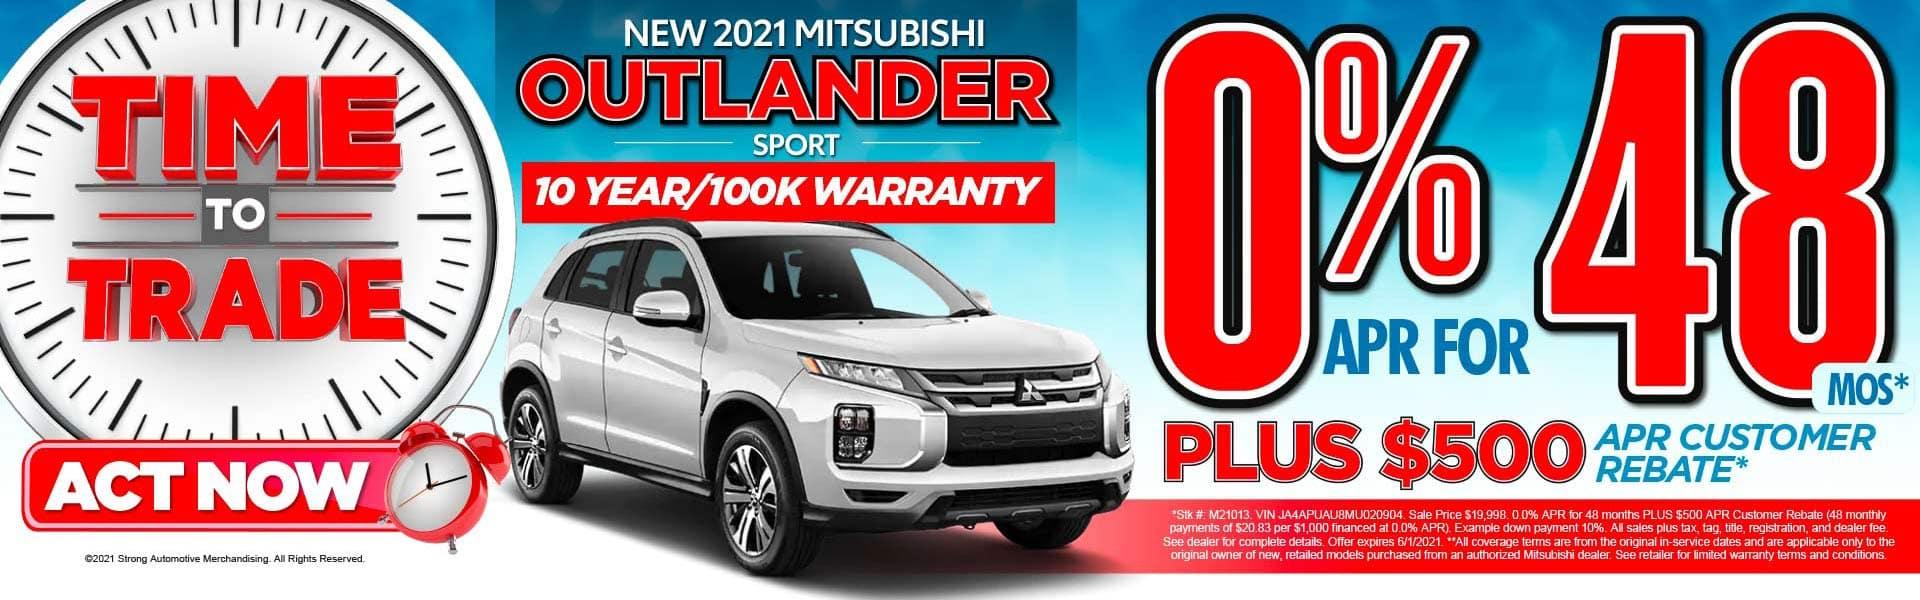 New 2021 Mitsubishi Outlander Sport – 0.0% for 48 months PLUS $500 APR Customer Rebate*